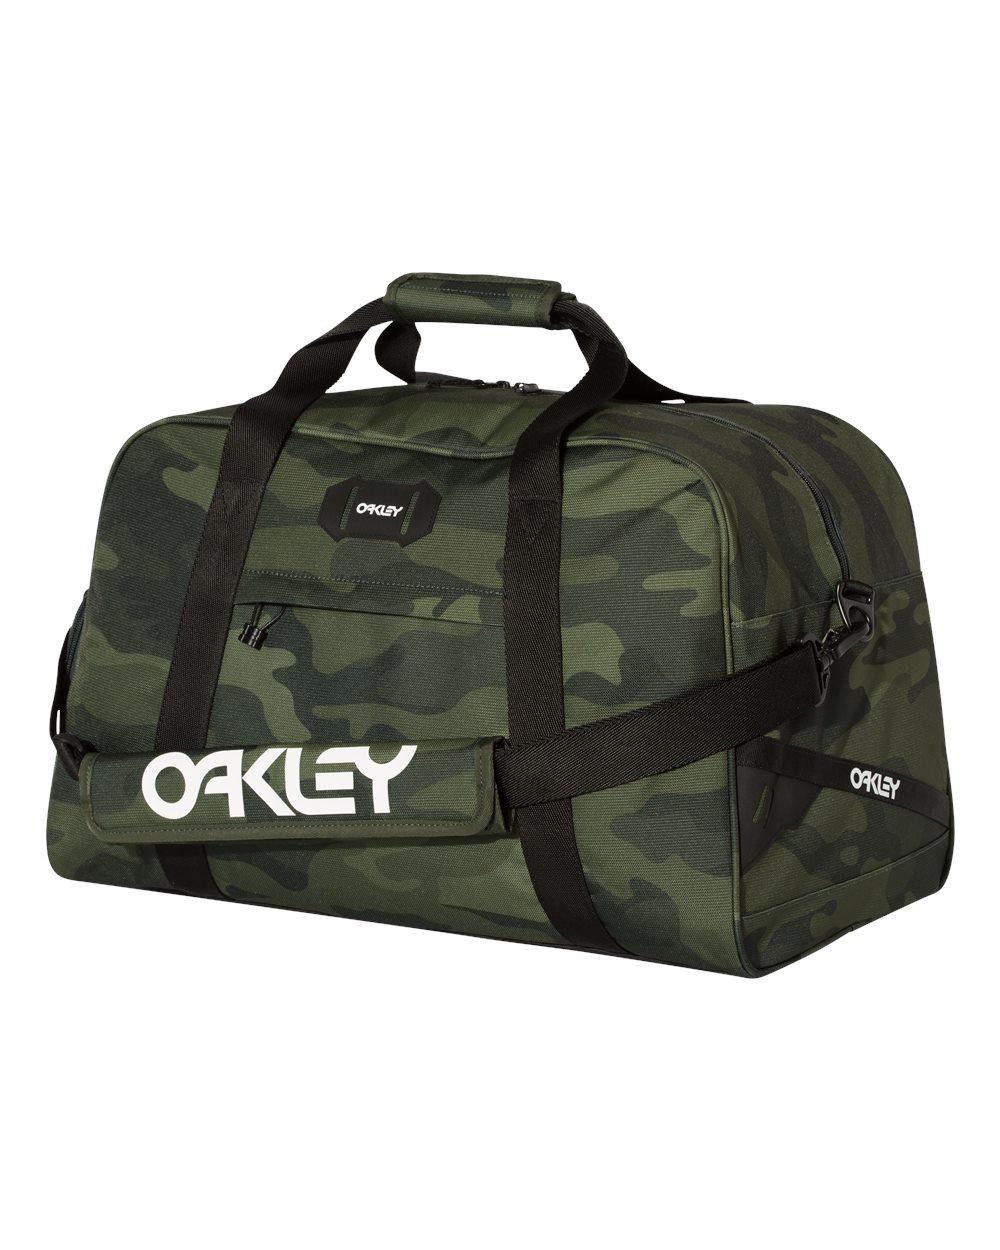 Oakley 921443ODM - 50L Street Duffel Bag